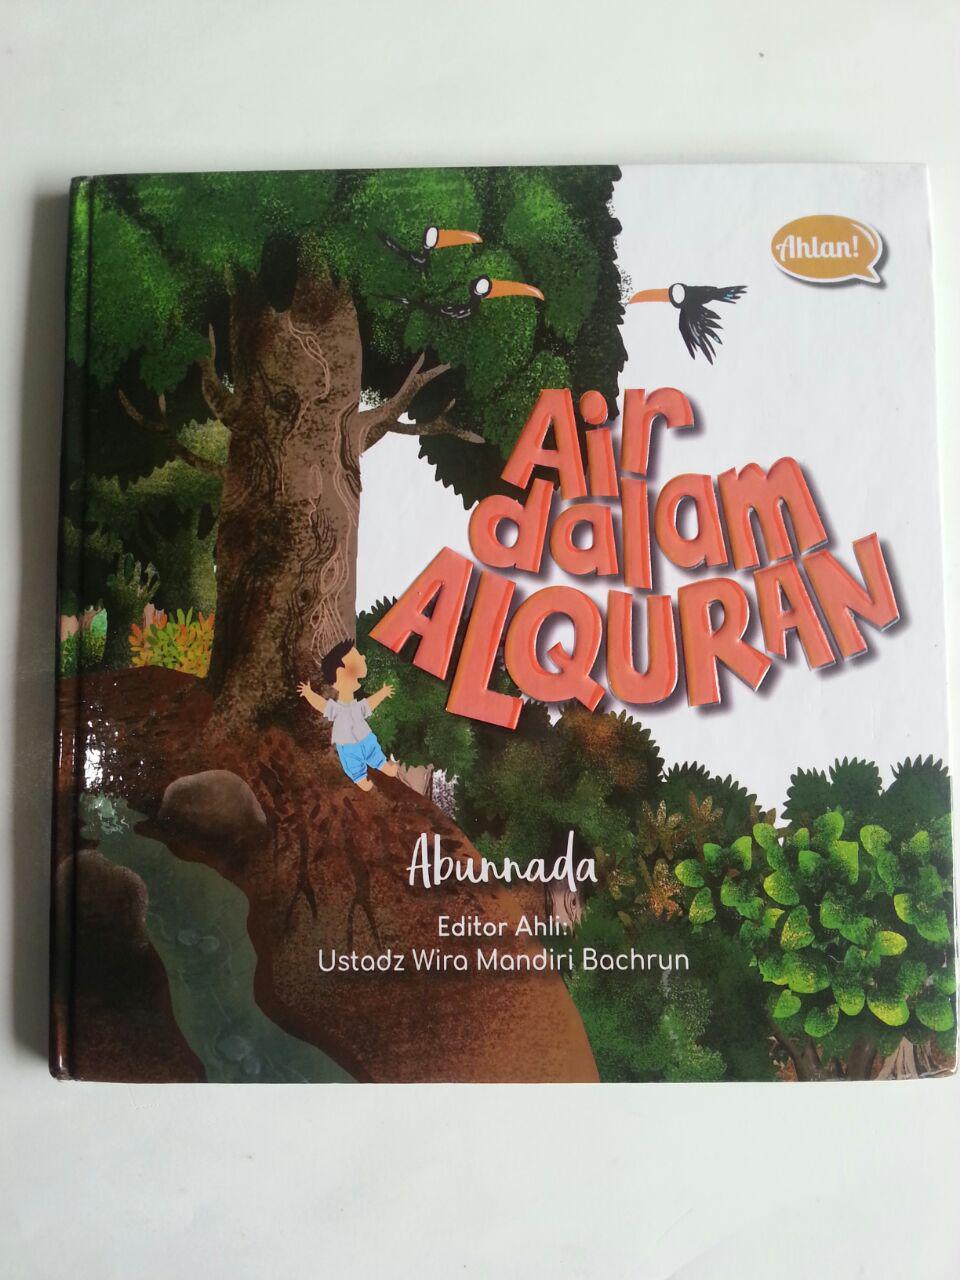 Buku Anak Air Dalam Al-Qur'an cover 2